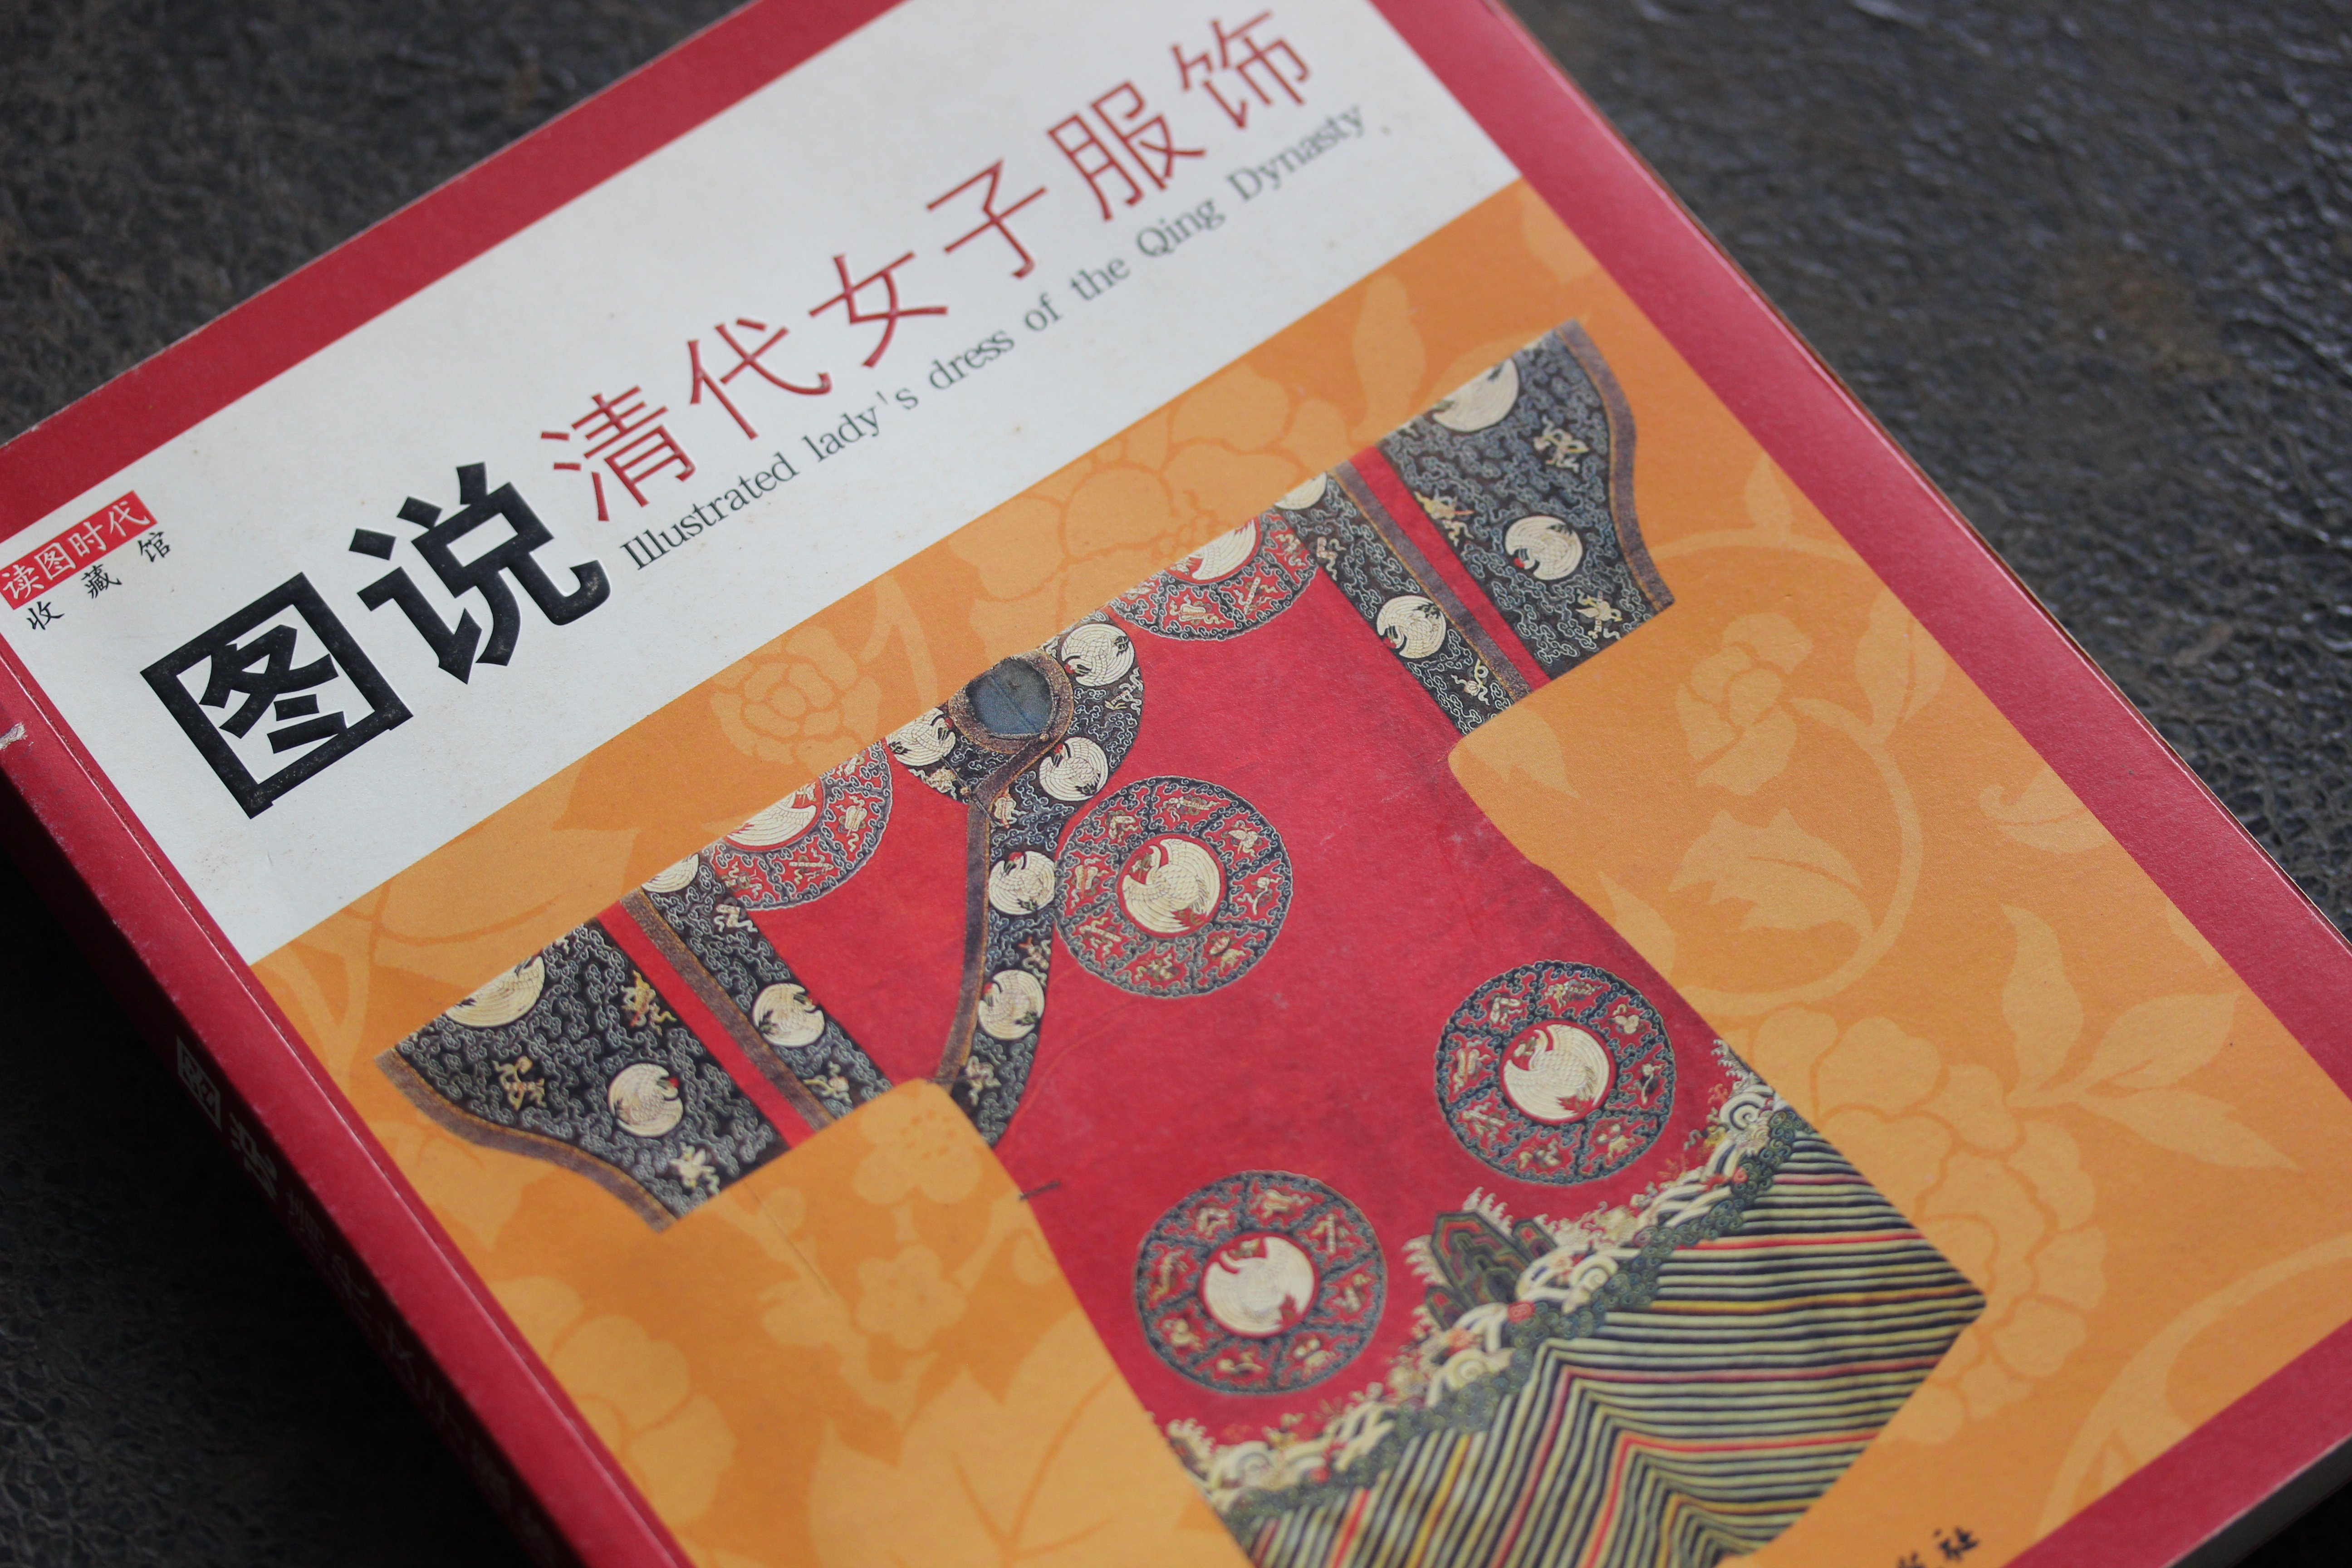 {kóo-ì antique 古憶舖} 絕版 史 圖說清代女子服飾 中國輕工業出版社